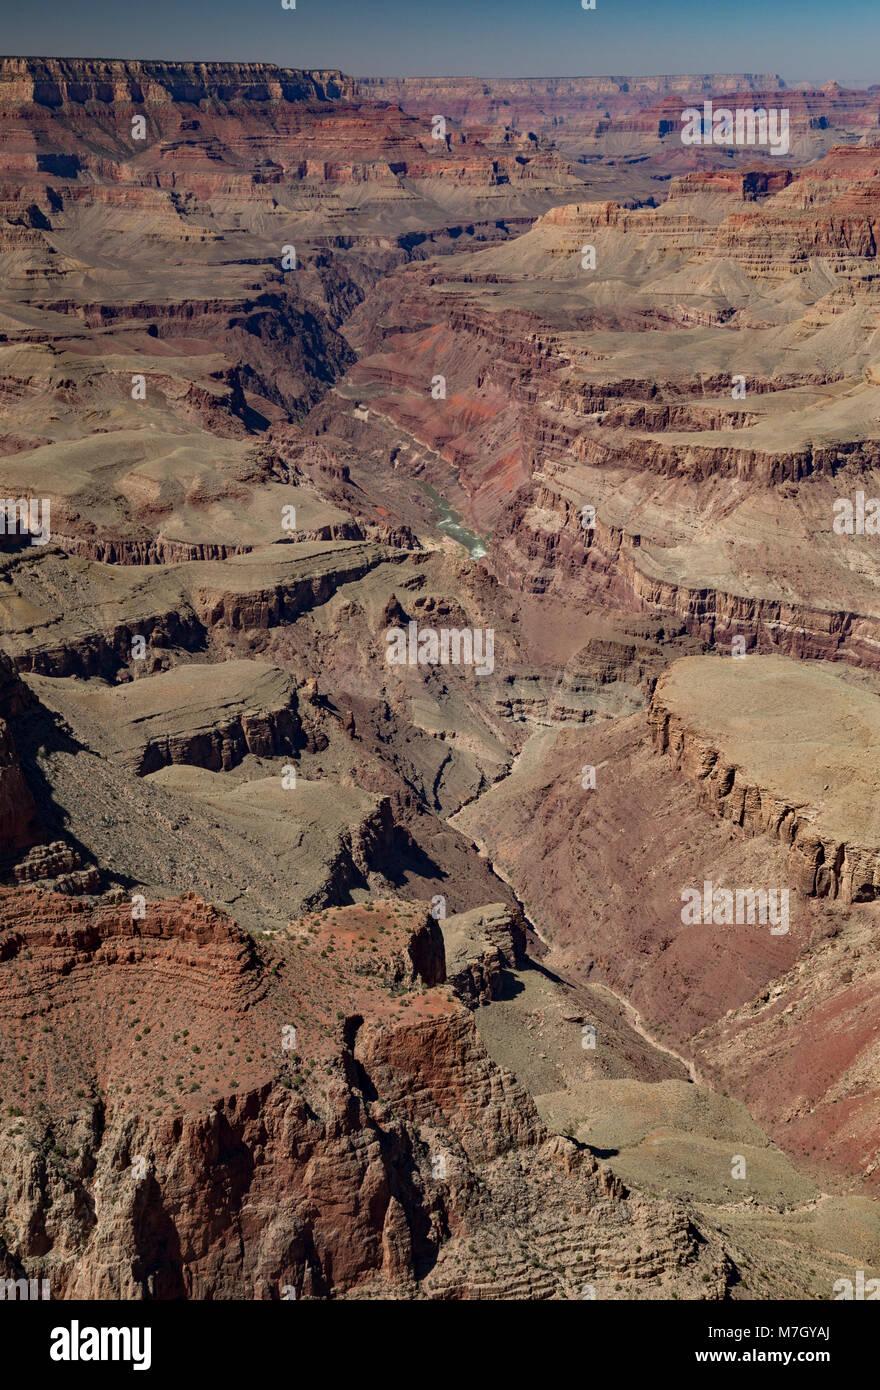 Looking west along Seventyfive Mile Creek from Lipan Point, Grand Canyon South Rim, Arizona, USA Stock Photo